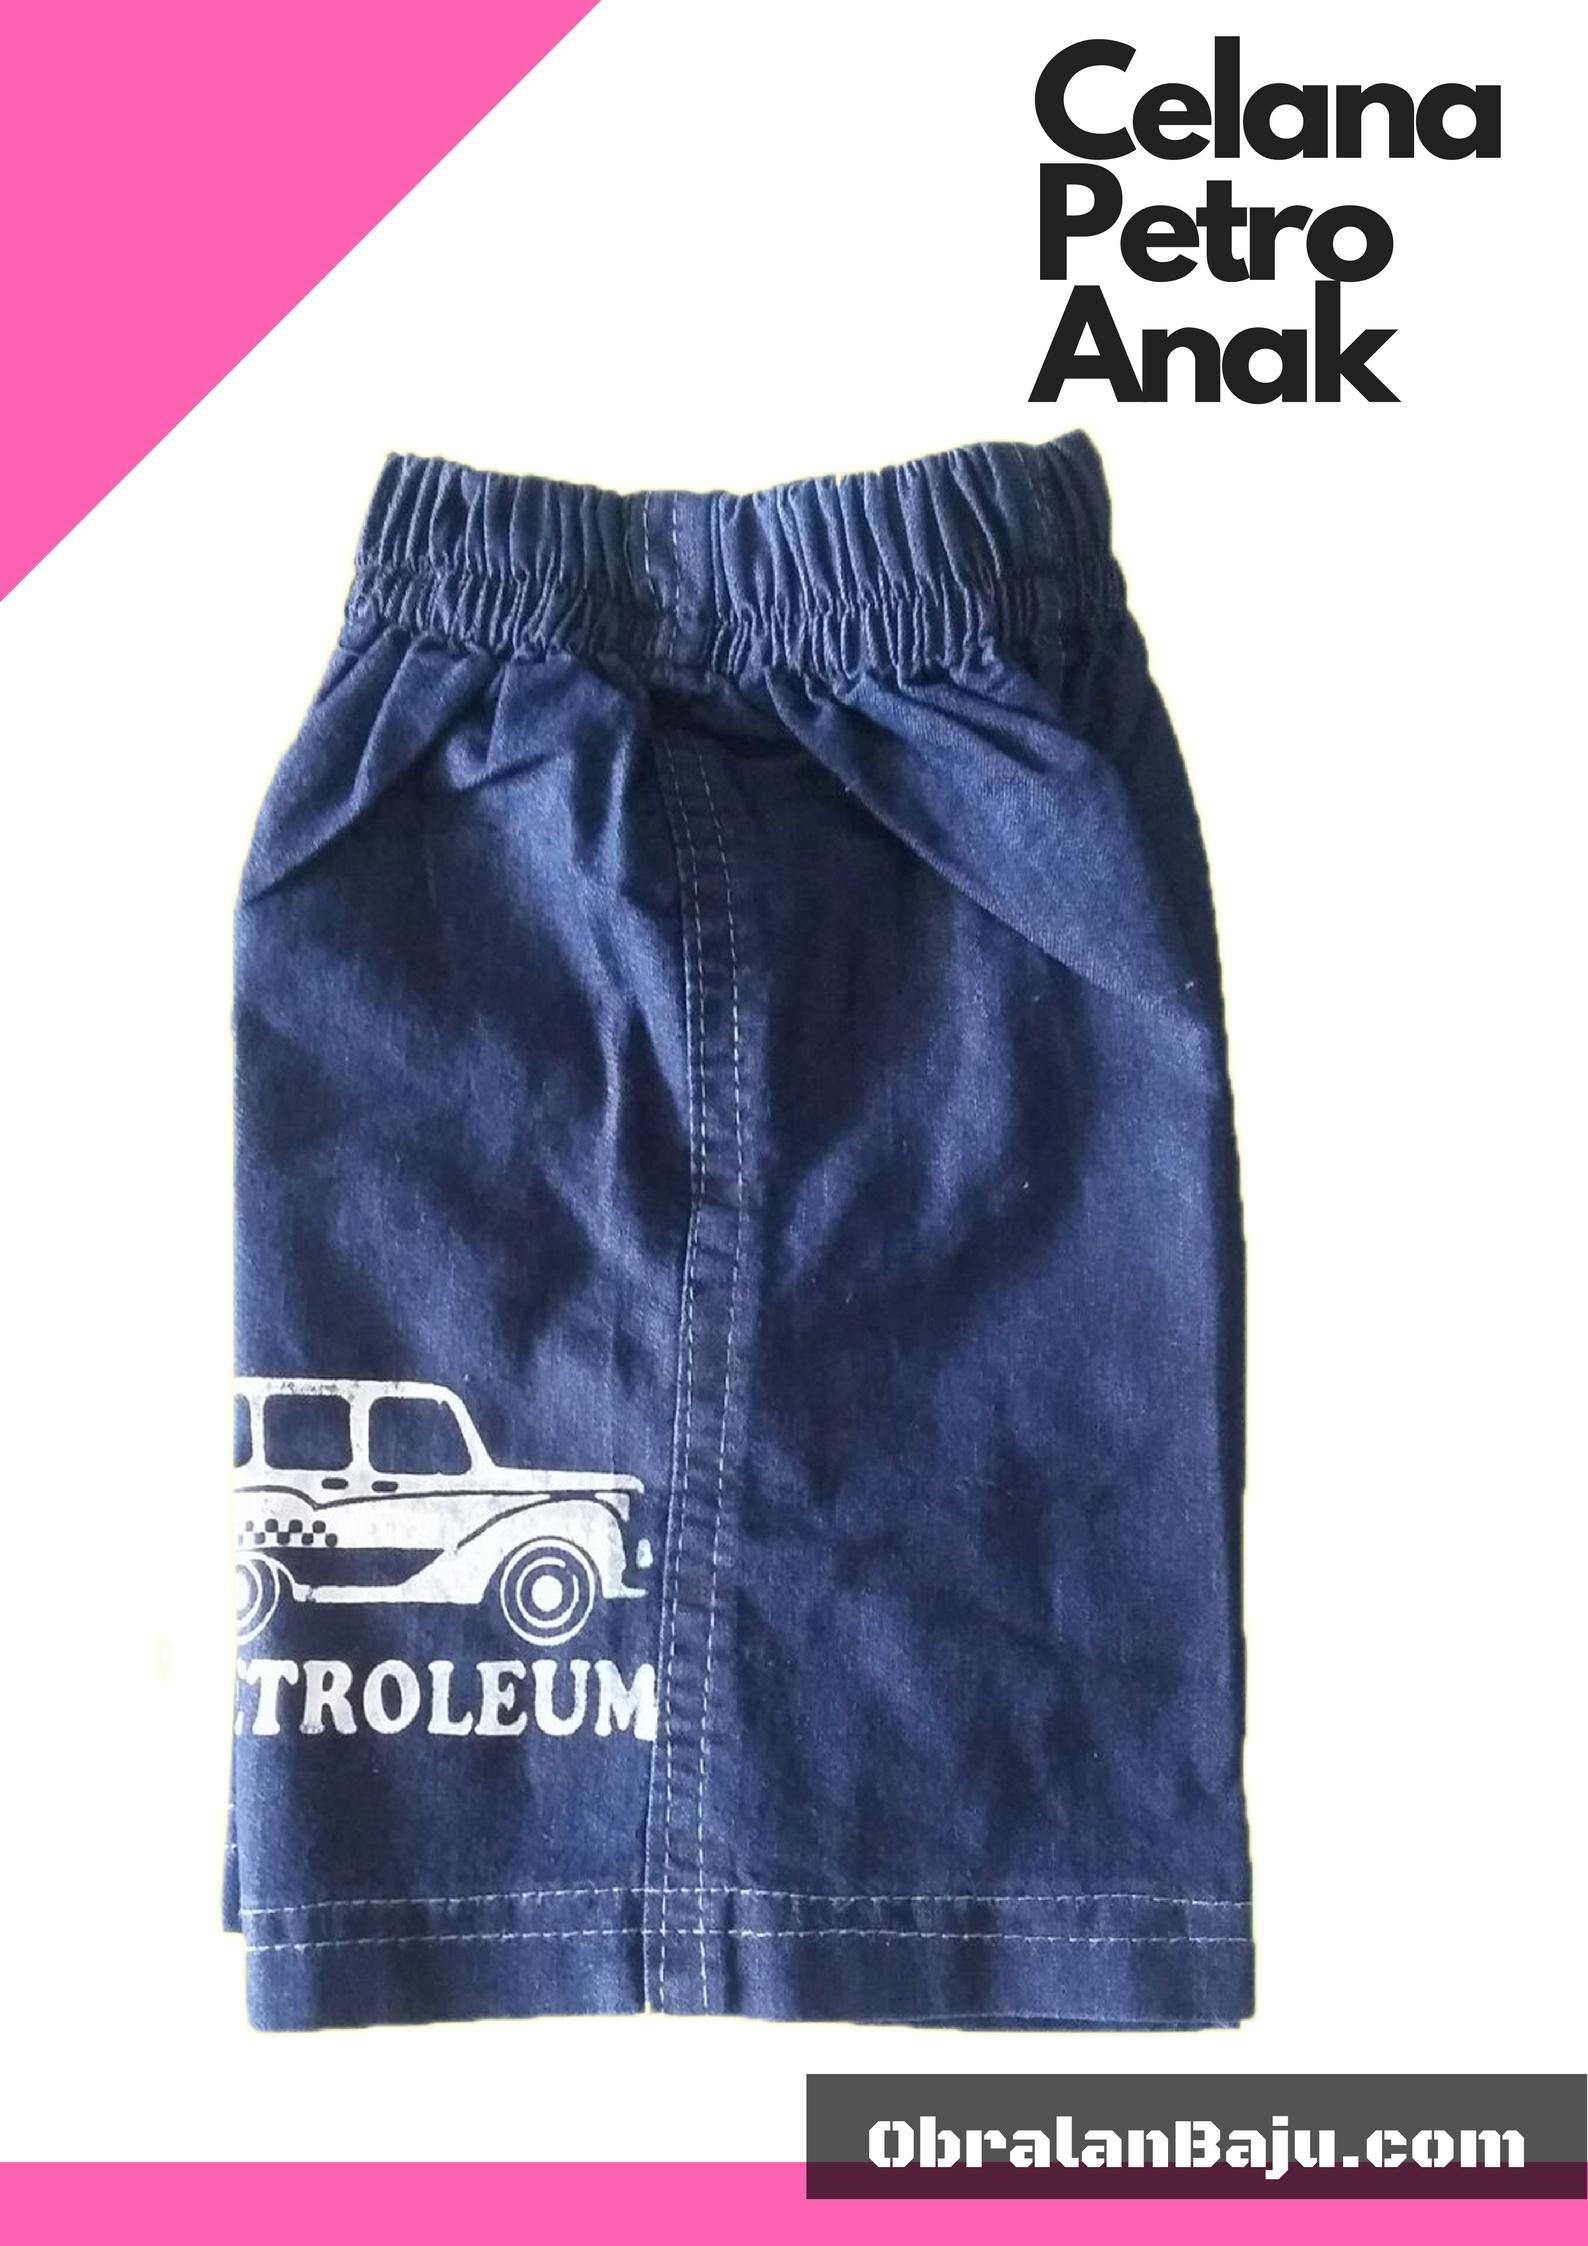 ObralanBaju.com Obral Baju Pakaian Murah Meriah 5000 Celana Petro